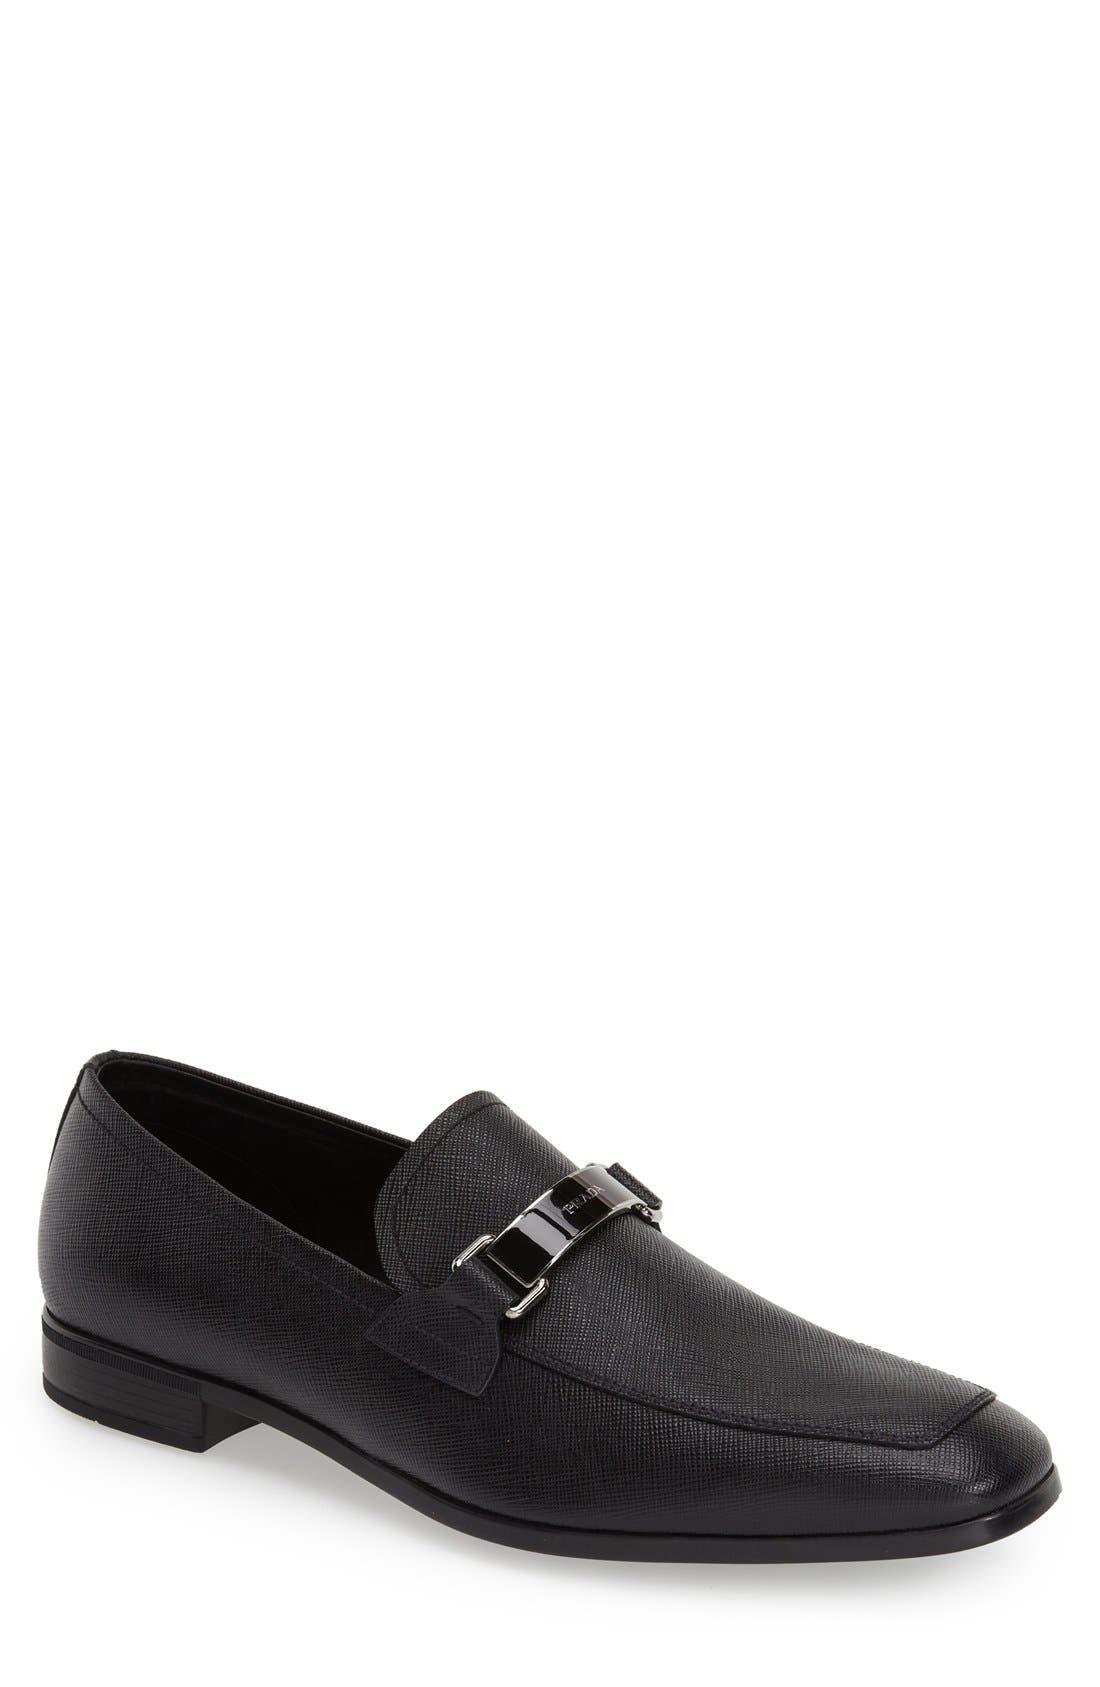 PRADA Saffiano Leather Bit Loafer, Main, color, NERO LEATHER